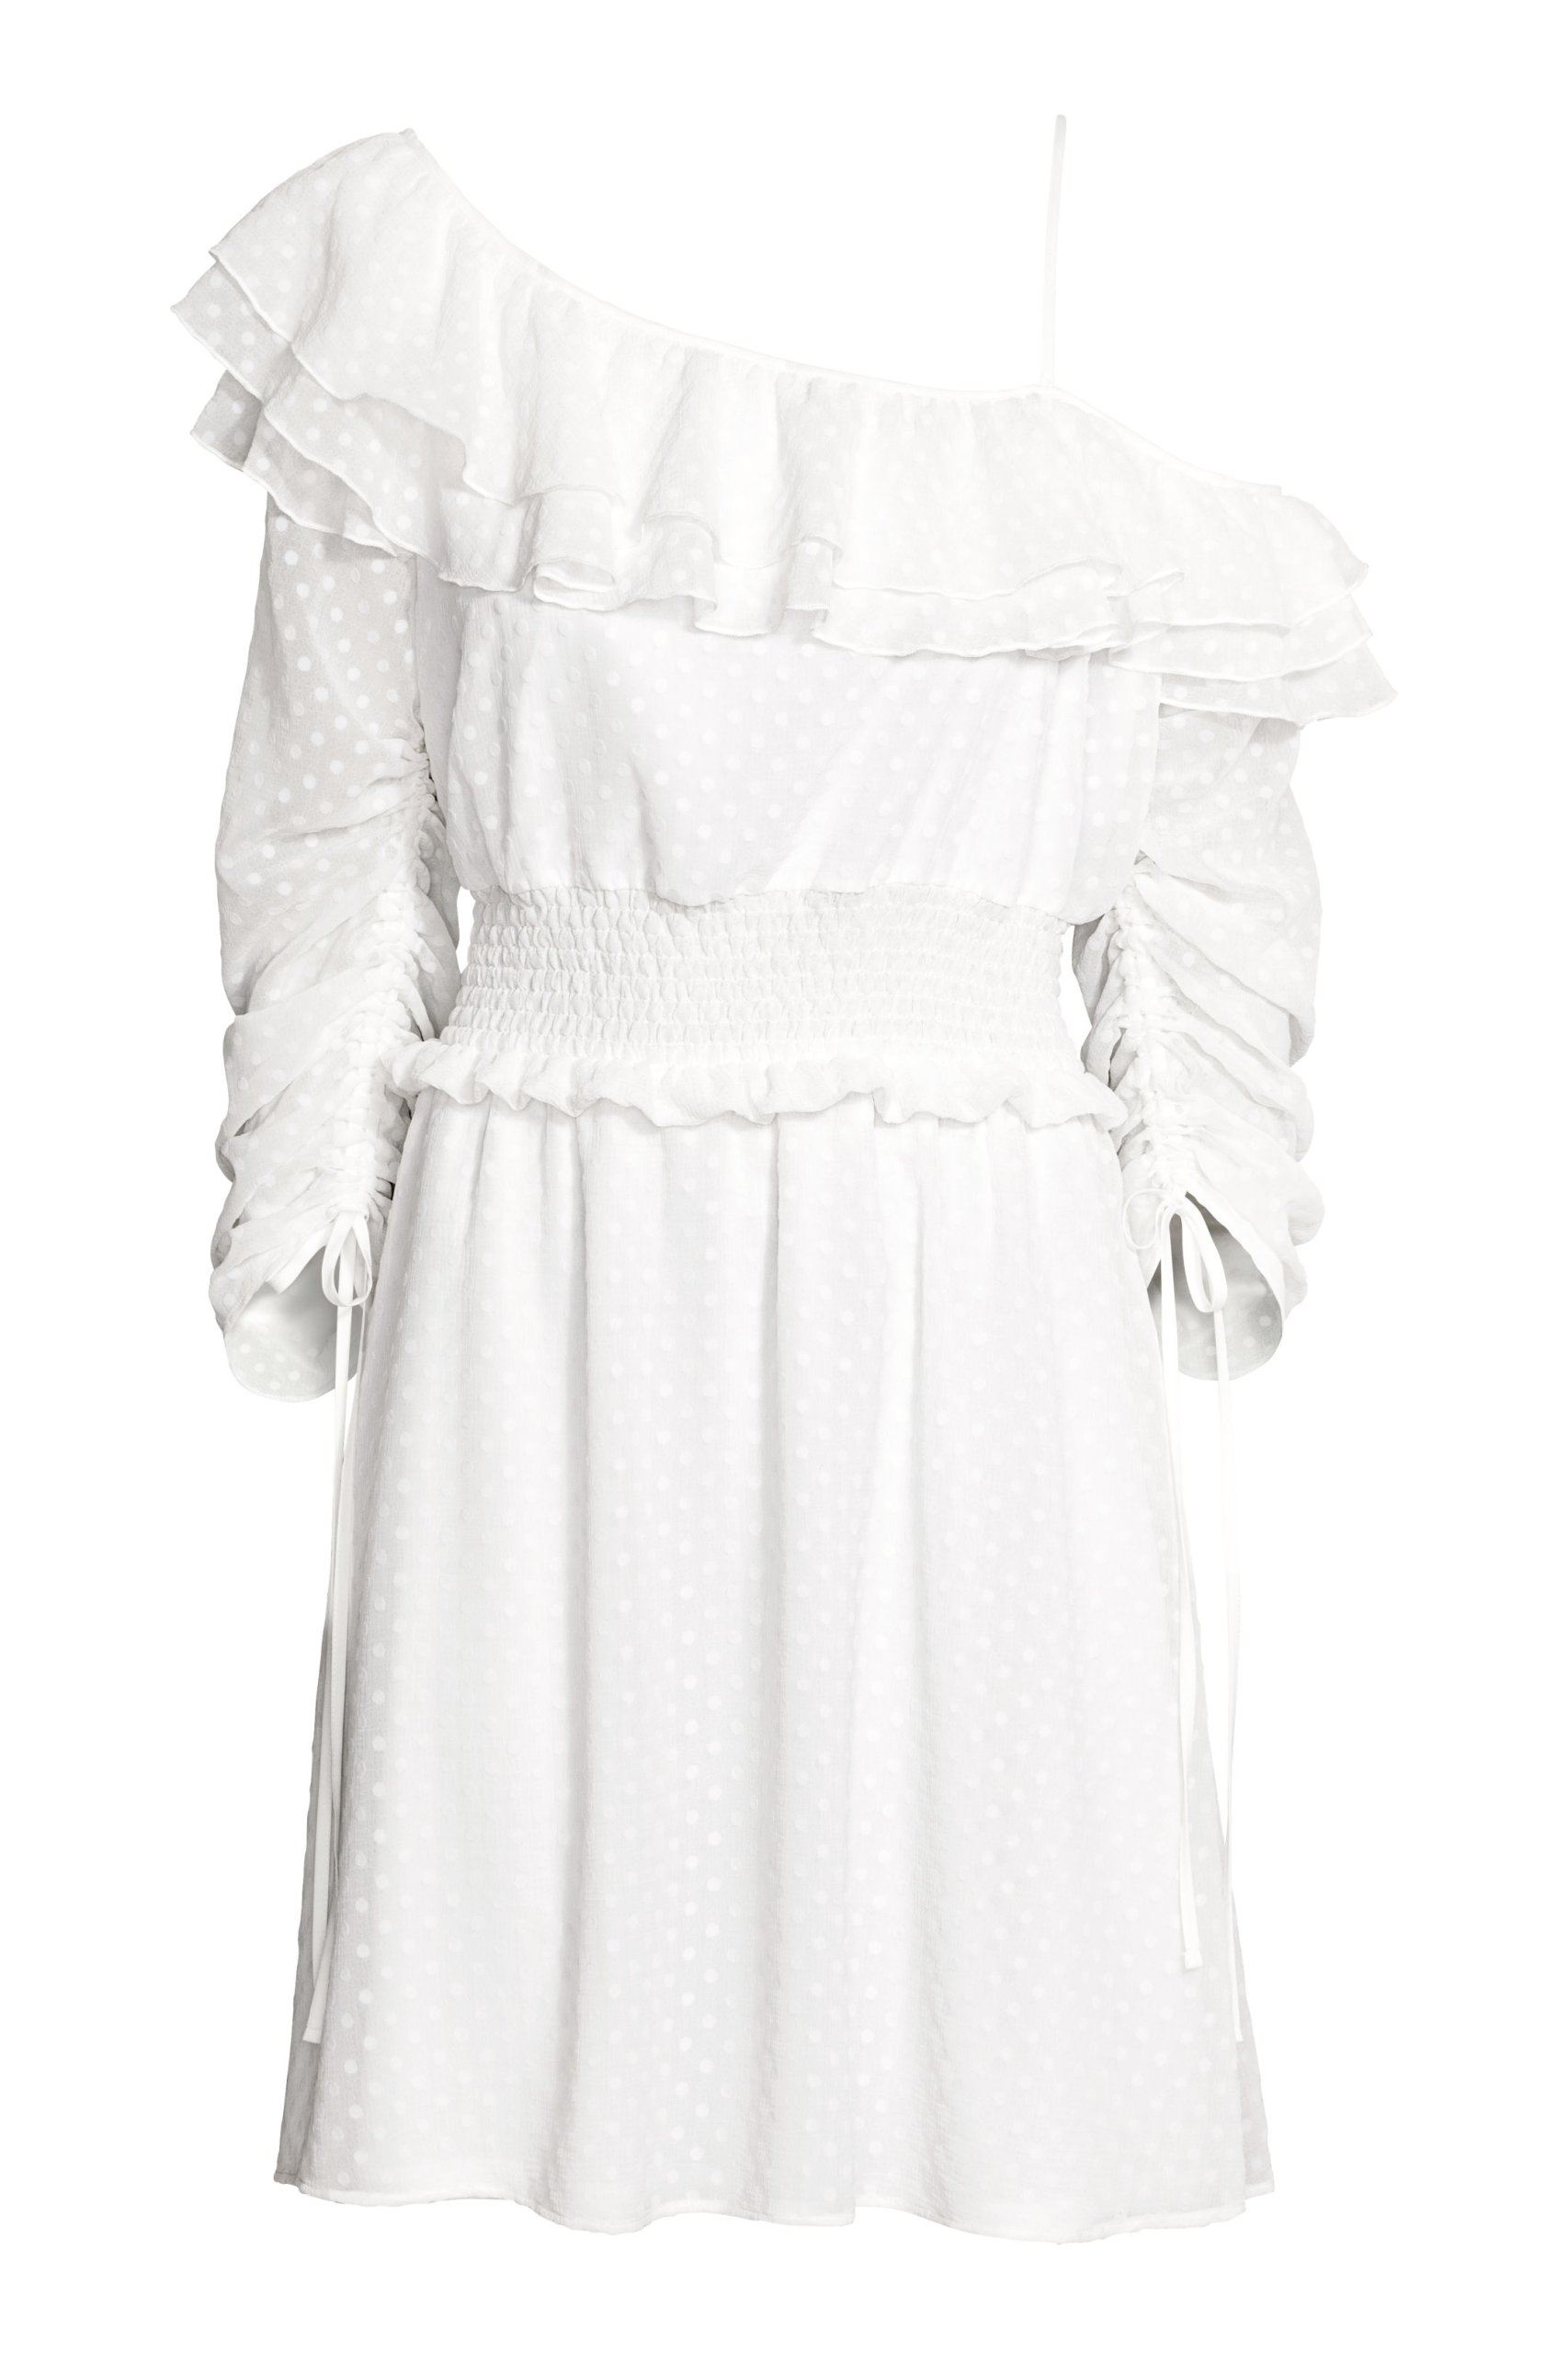 2fb6a1e206 Sukienka boho falbany H M trend biała 42 HIT - 7232680966 ...